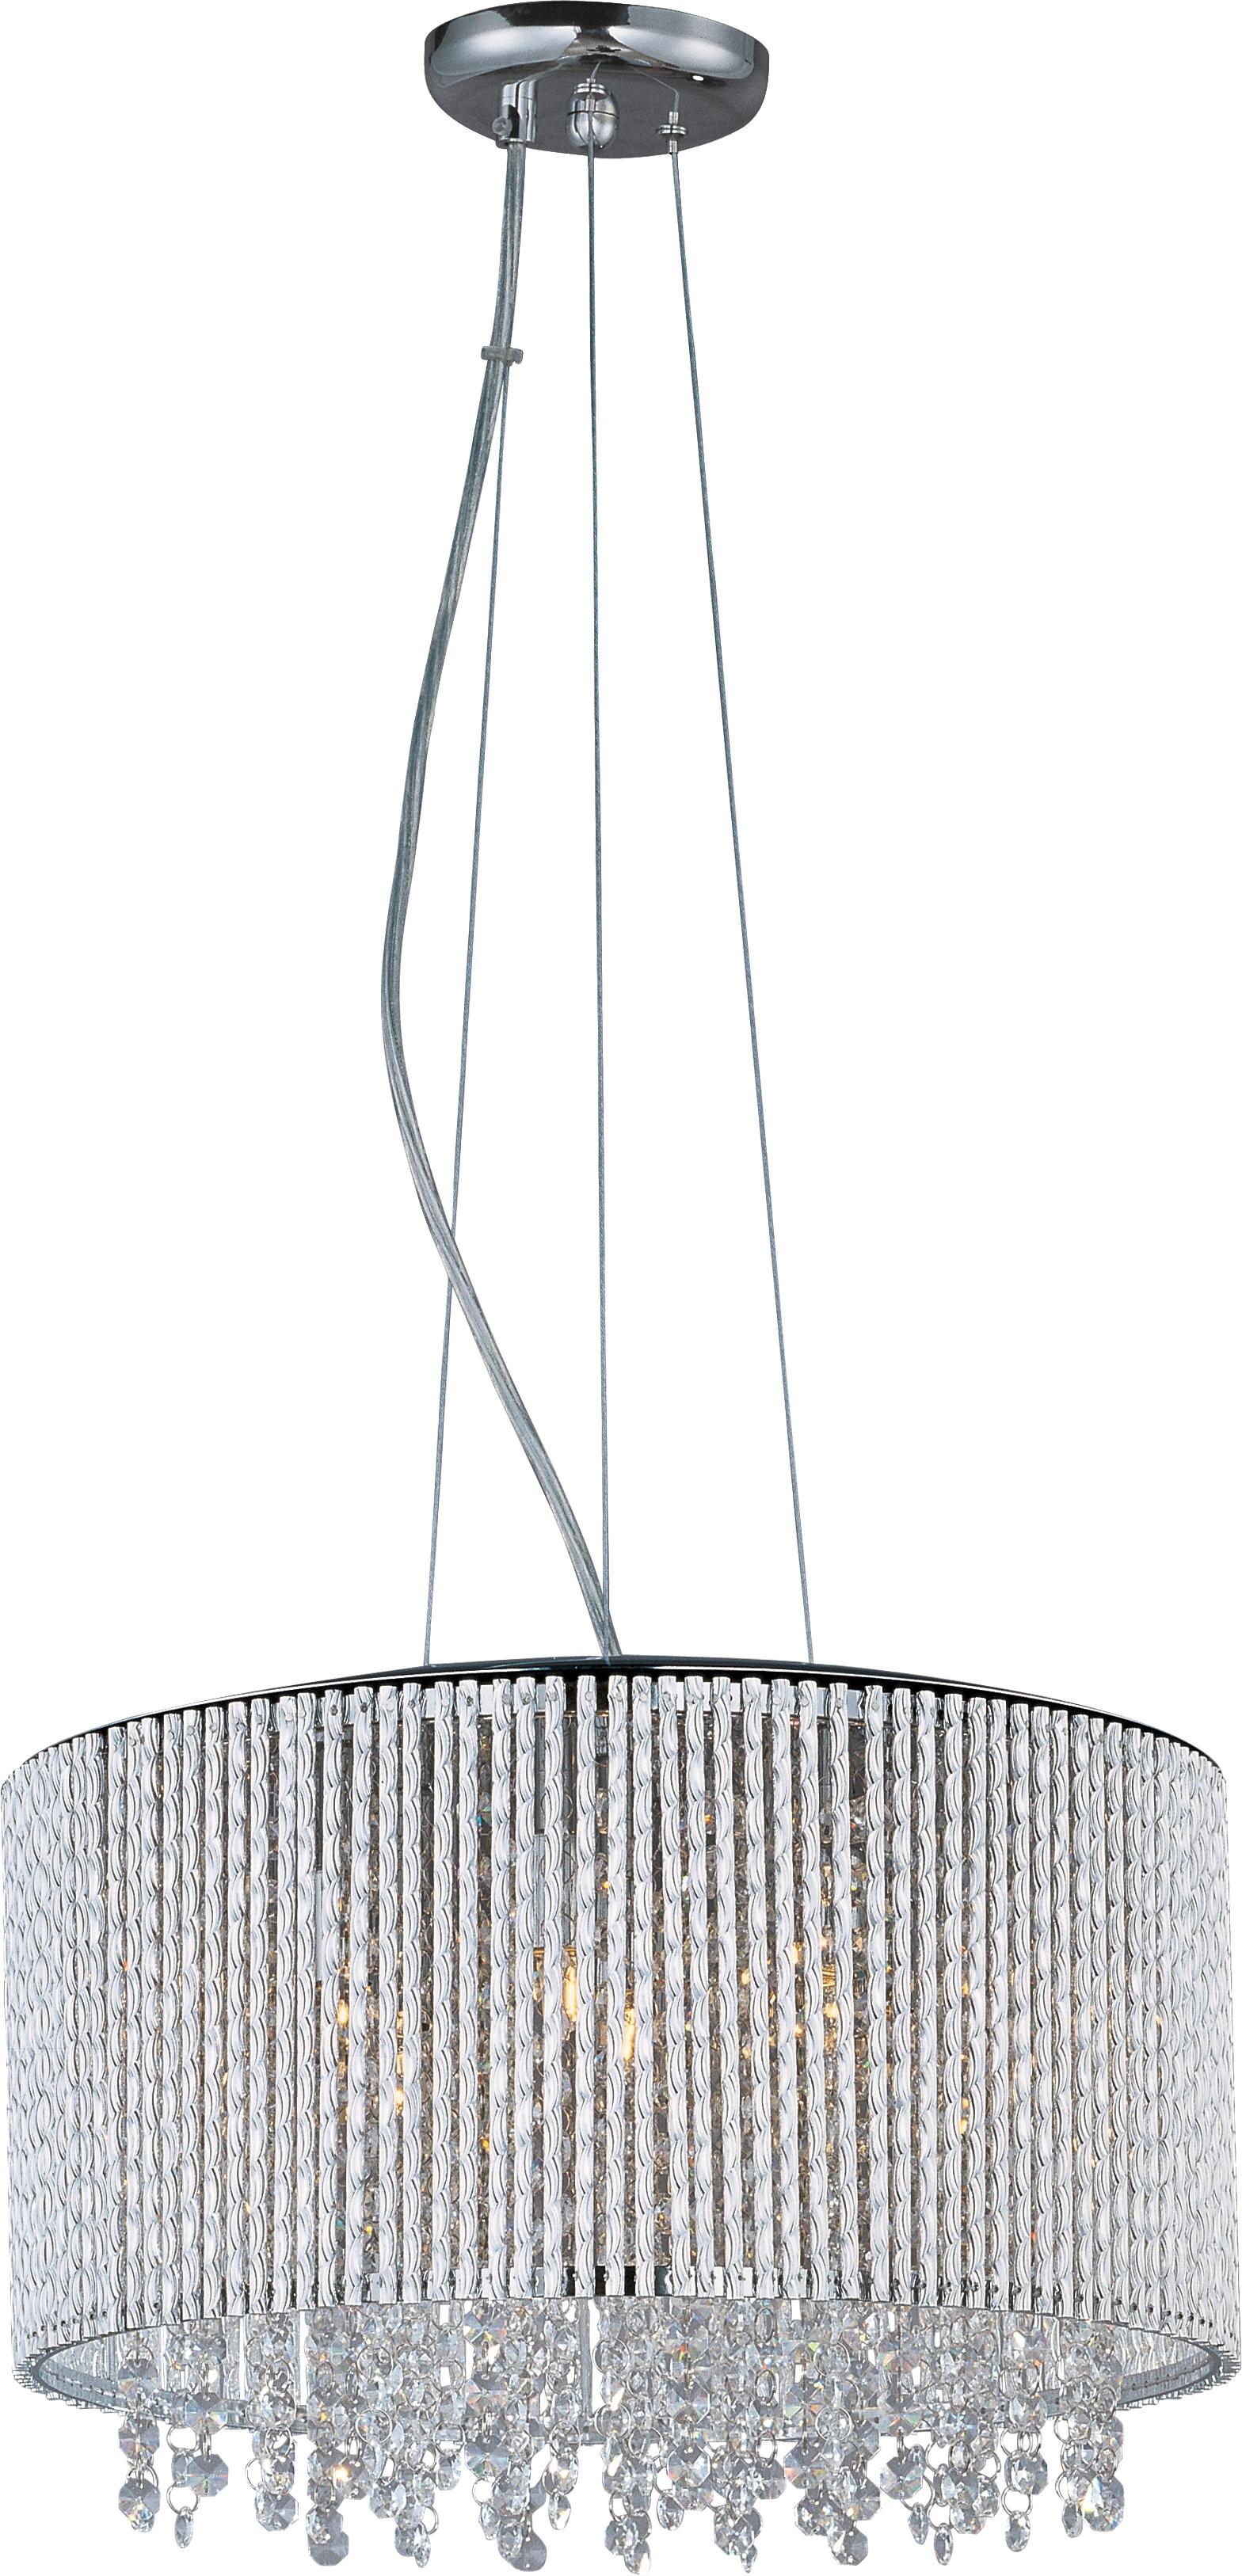 Spiral 7 Light Pendant